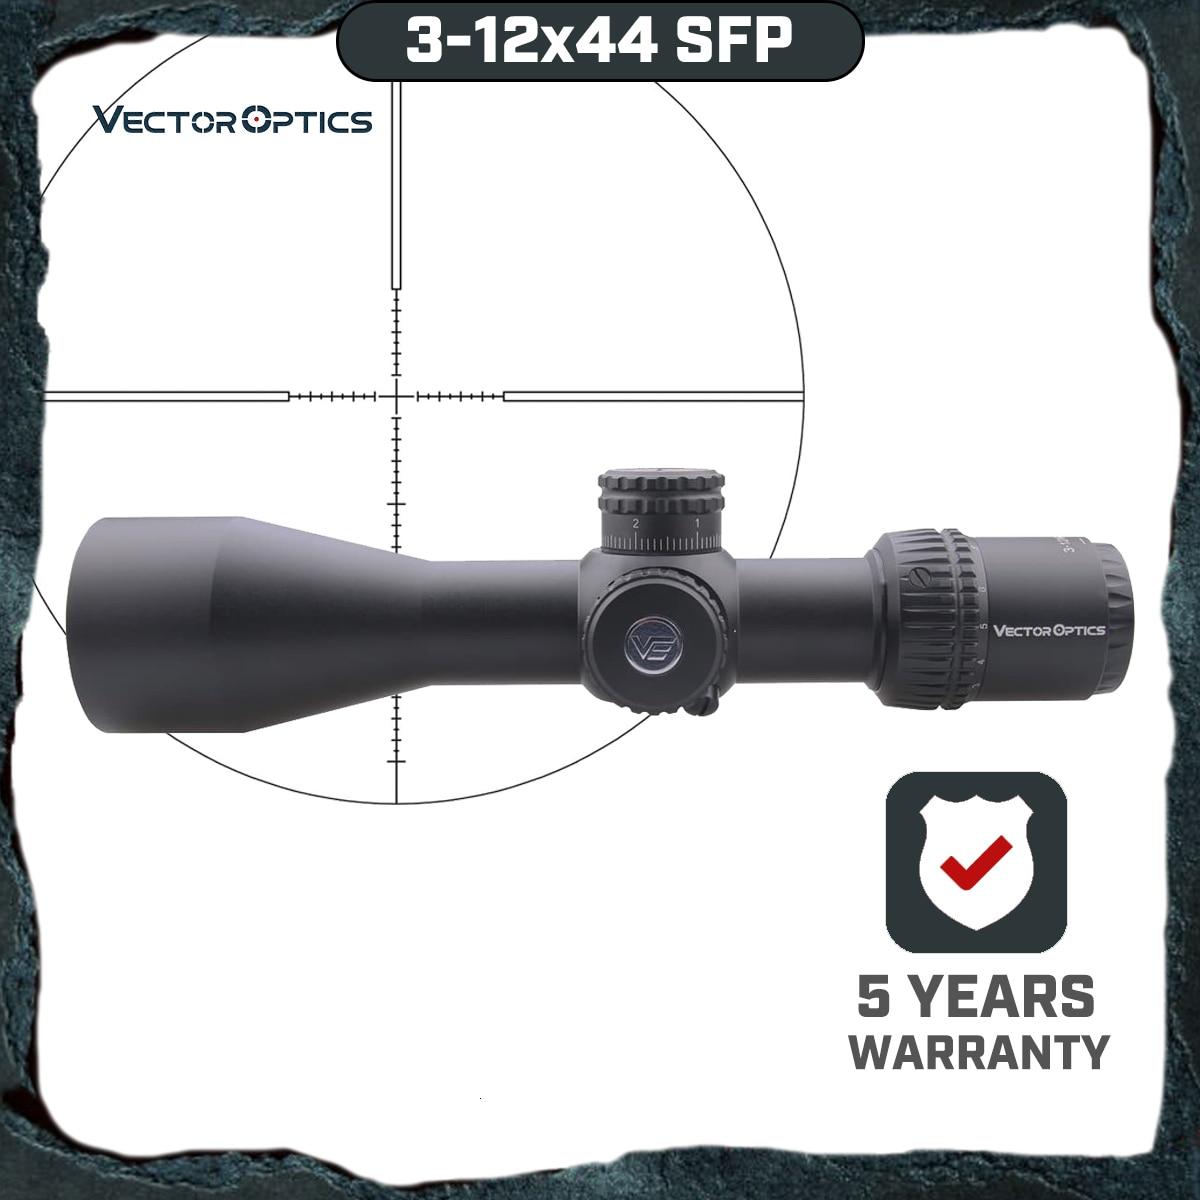 Vector Optics Veyron SFP 3 12x44 Riflescope Ultra Compact Air Rifle Scope Second Focal Plane Air Gun 1/10 MIL AR15 .223 7.62Riflescopes   -